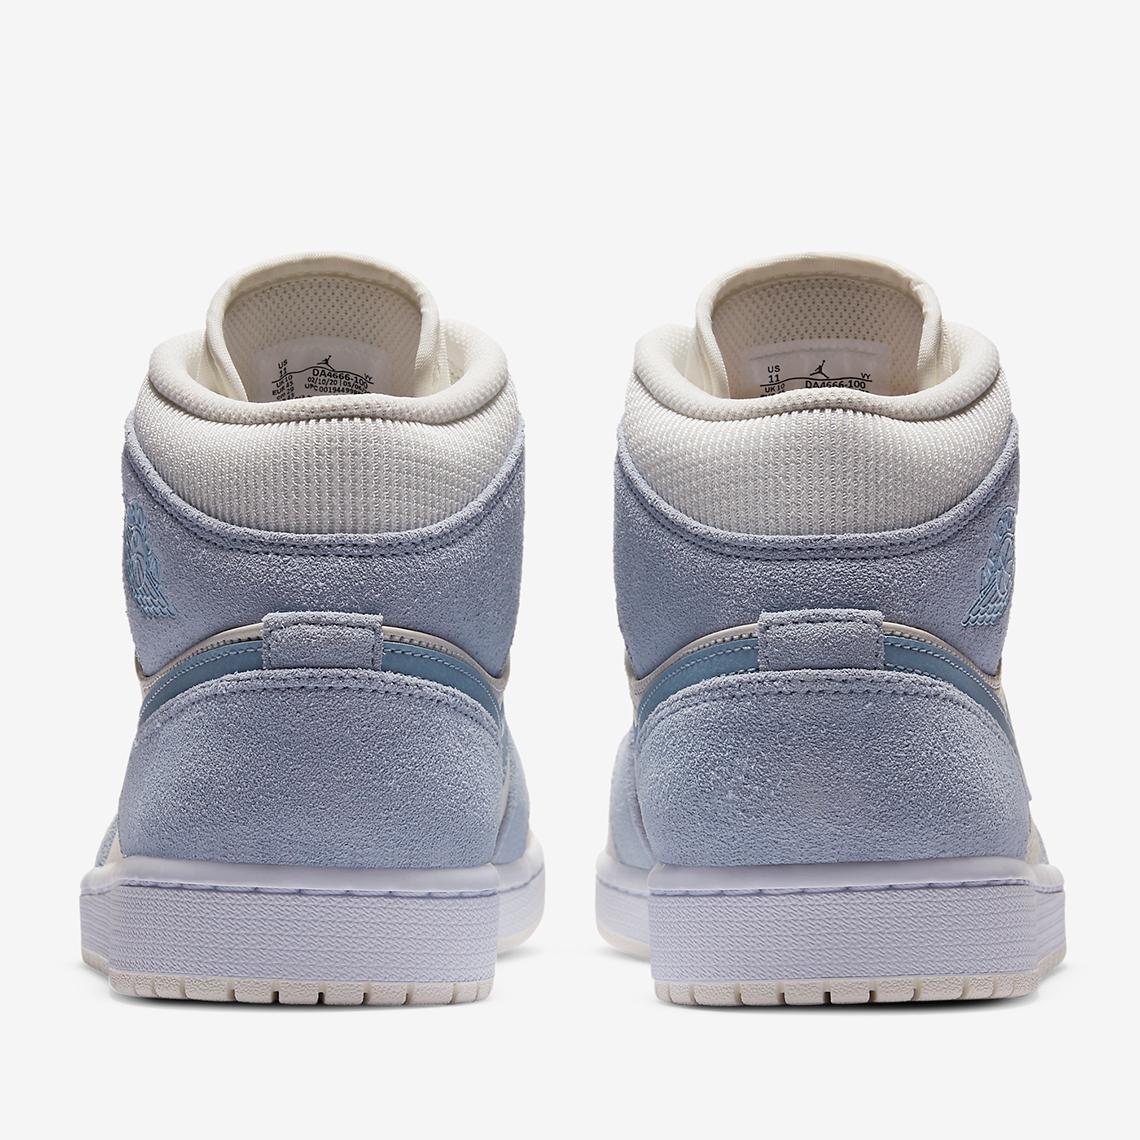 Air Jordan 1 Mid SE ''Textures Blue'' - DA4666-100